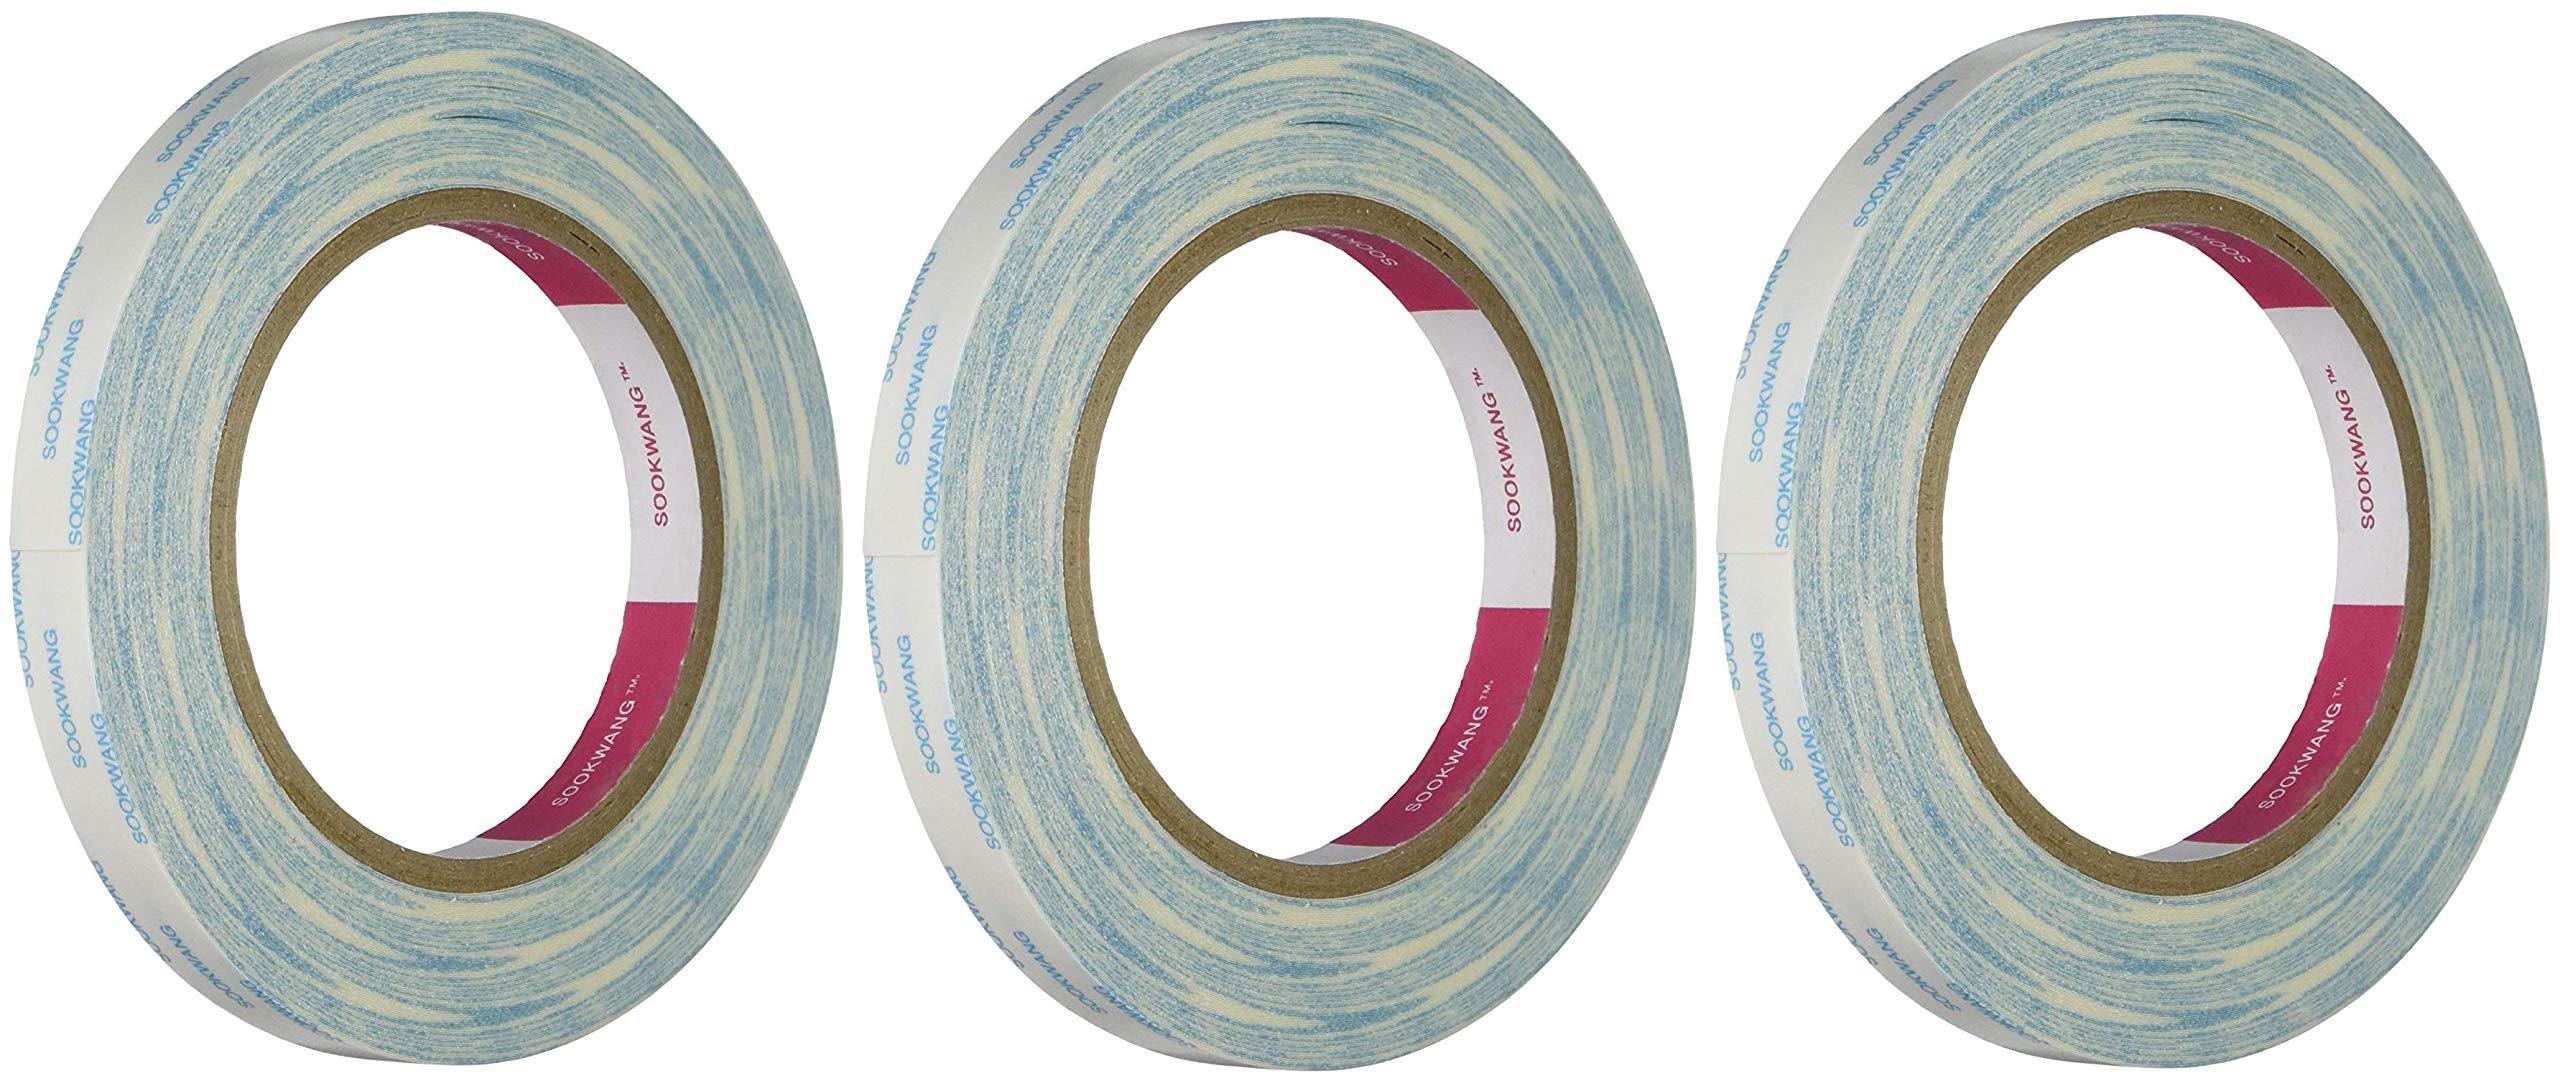 Scor-Pal SP203 Scor-Tape 1/2'' X 27yds- (Thrее Рack)